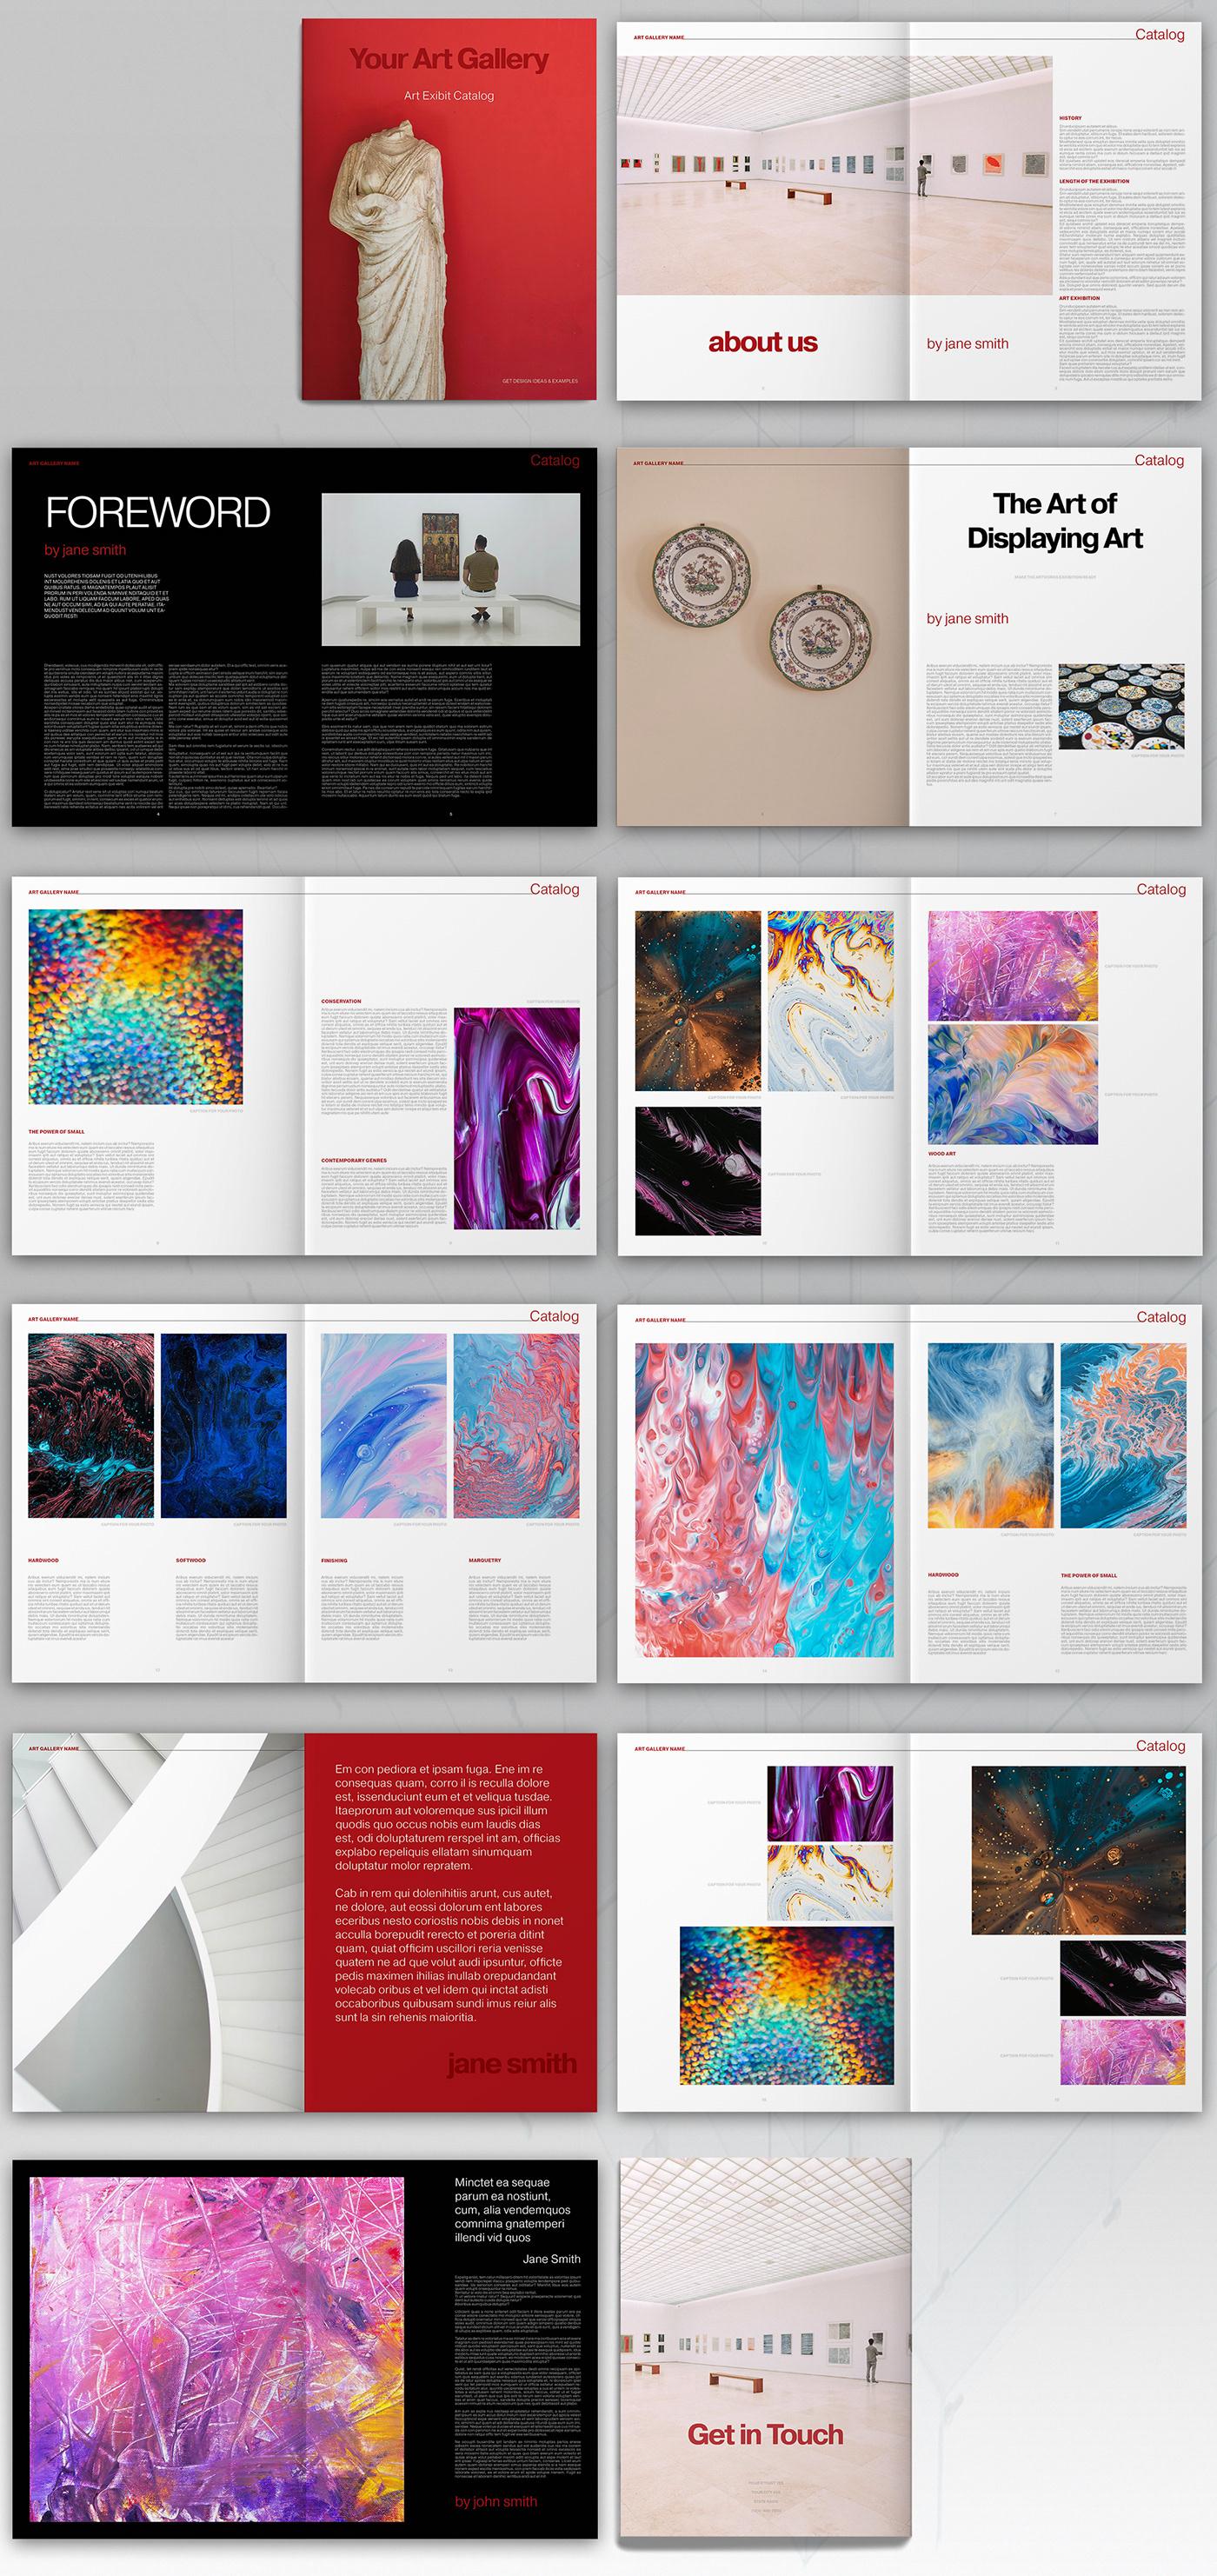 Image may contain: screenshot, painting and art